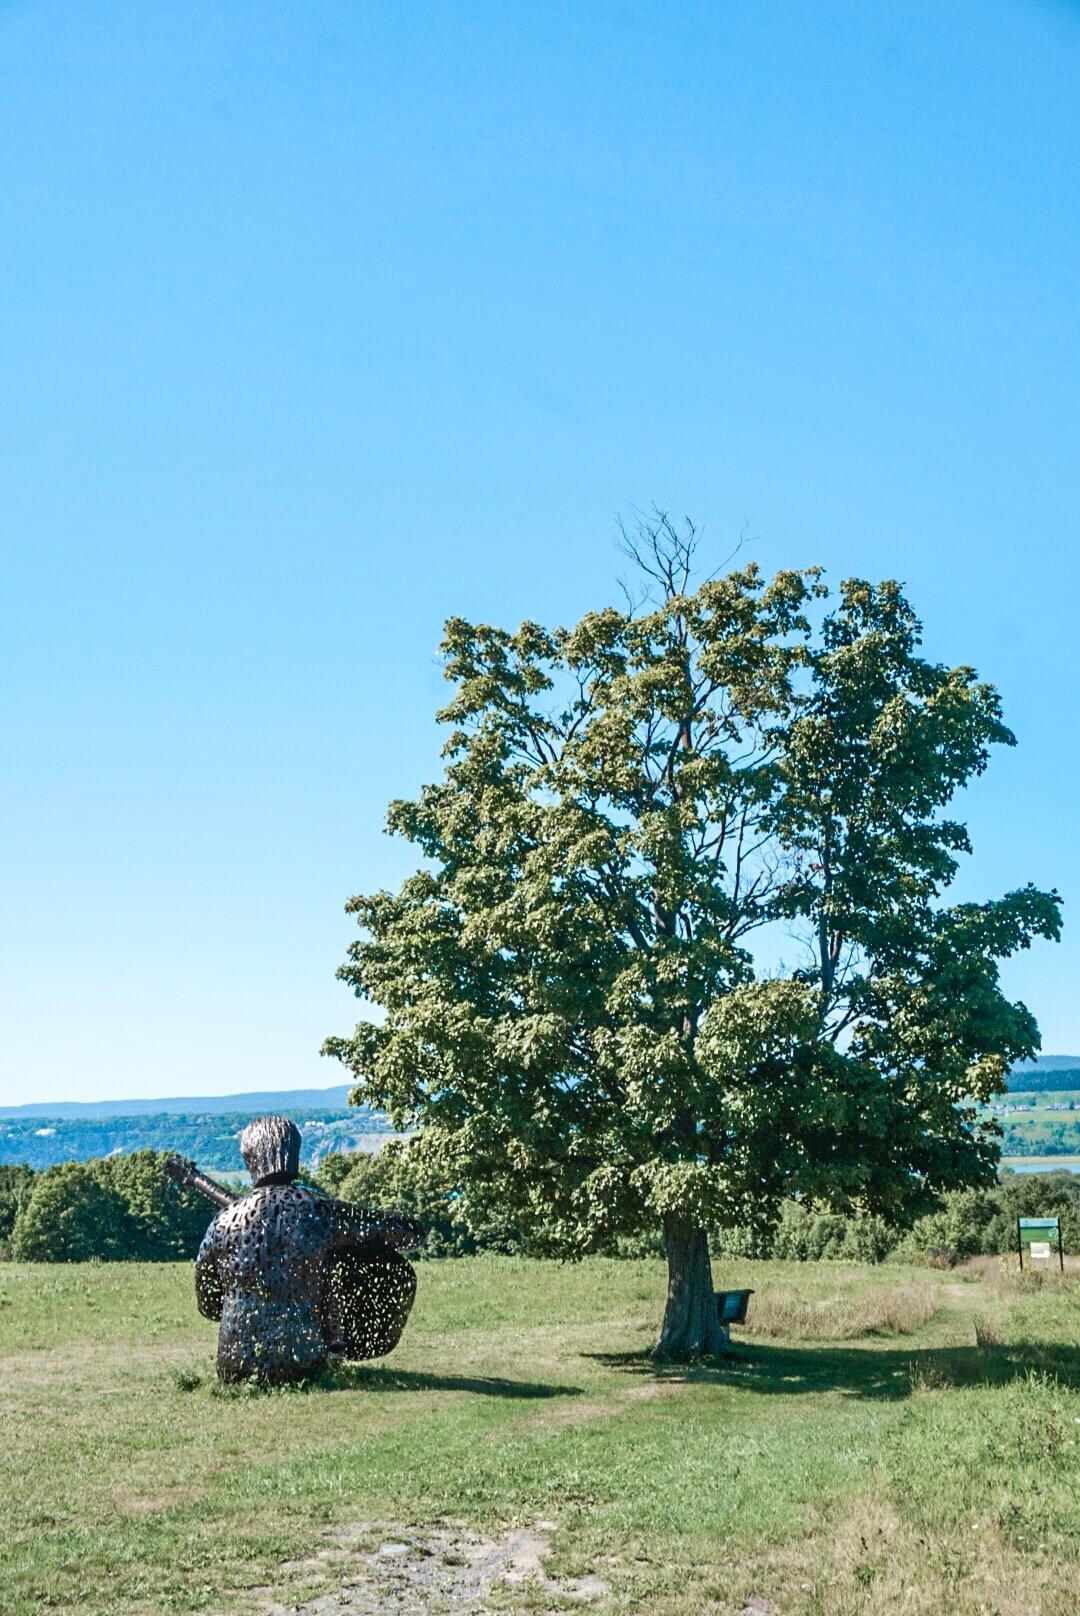 visiter ile d'orleans depuis quebec